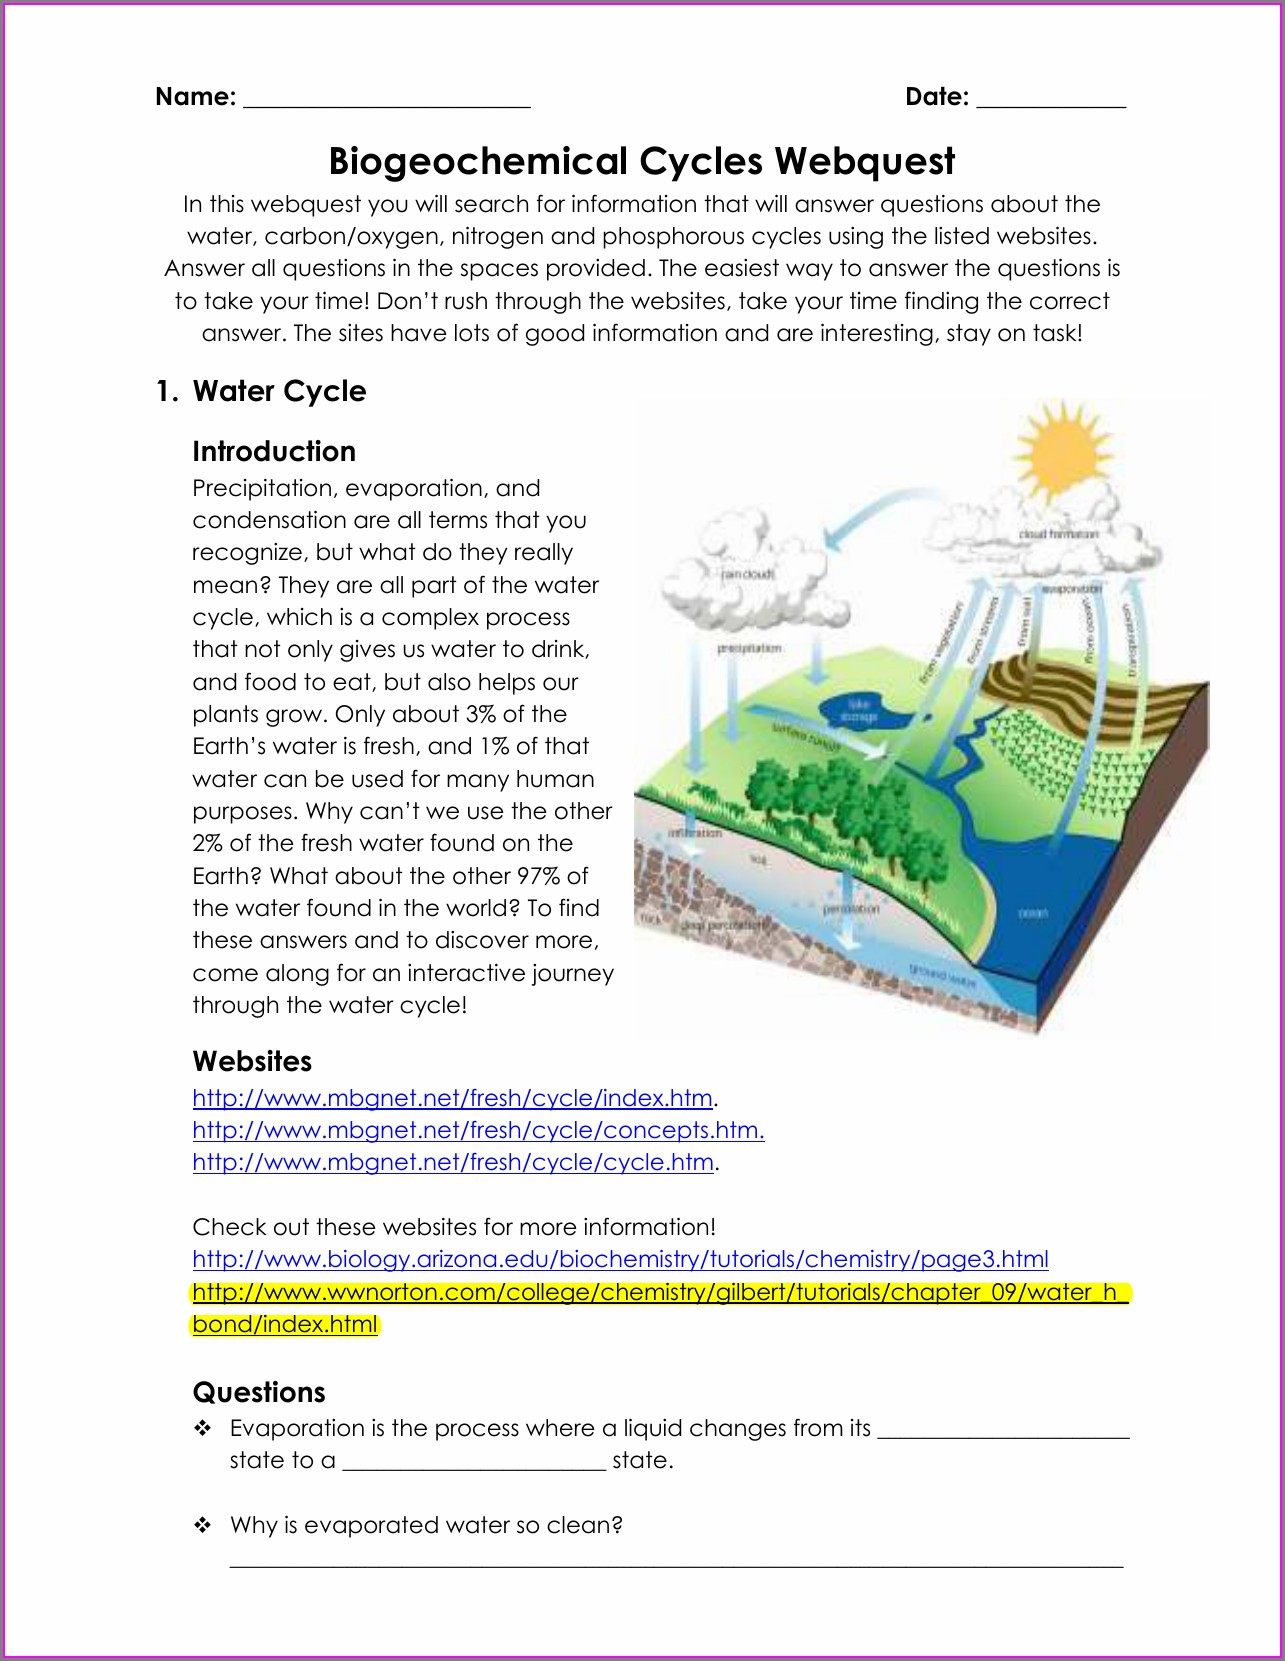 Nitrogen Cycle Biogeochemical Cycles Worksheet Answers